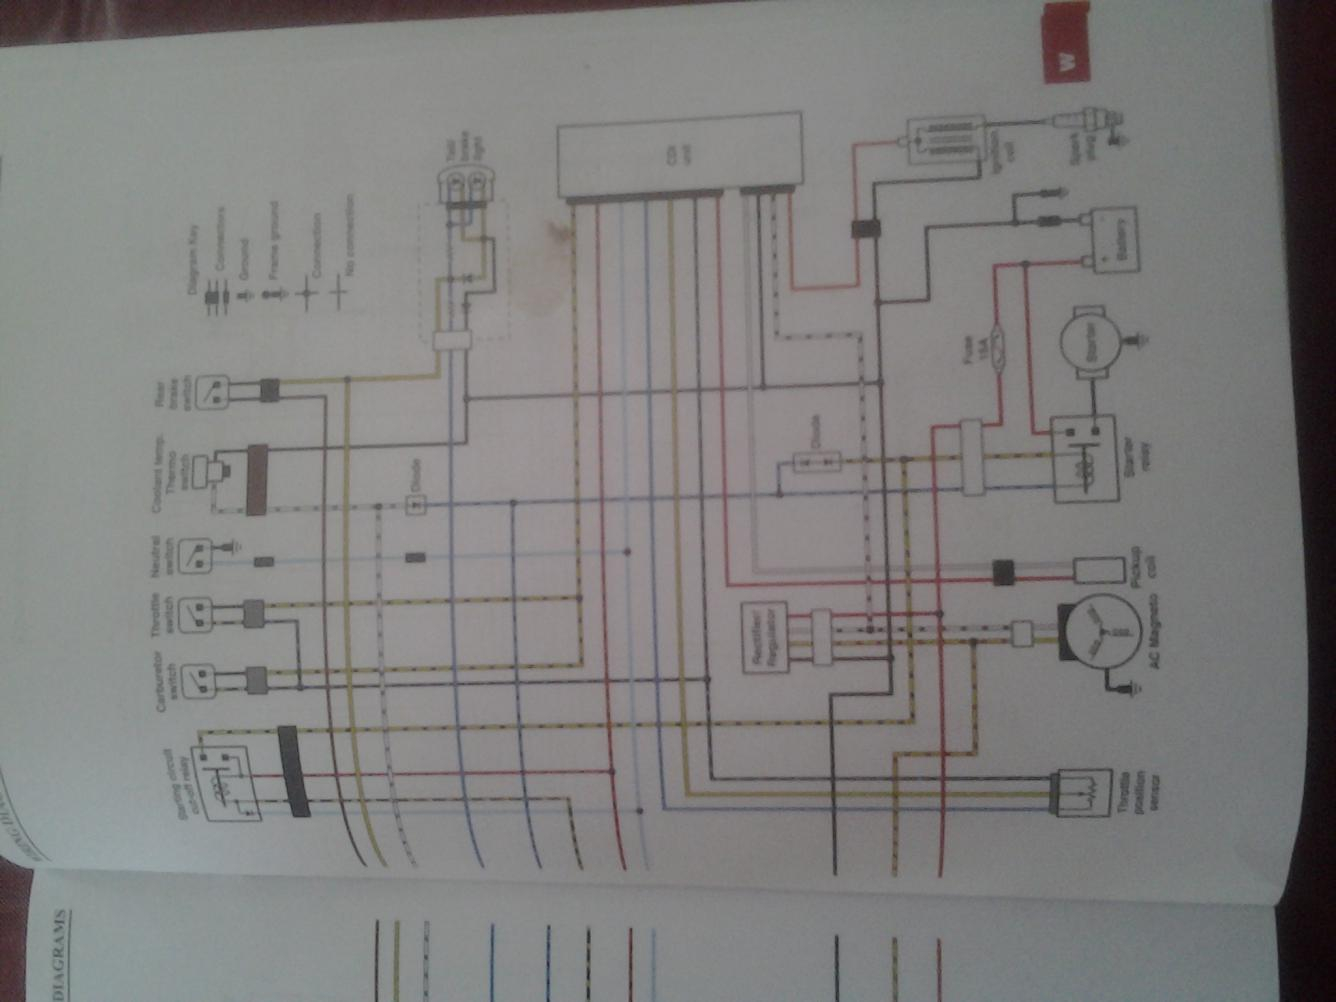 hight resolution of  2000 yfz 450 wiring diagram free download best wiring diagram yfz wiring diagram on yz426f 2006